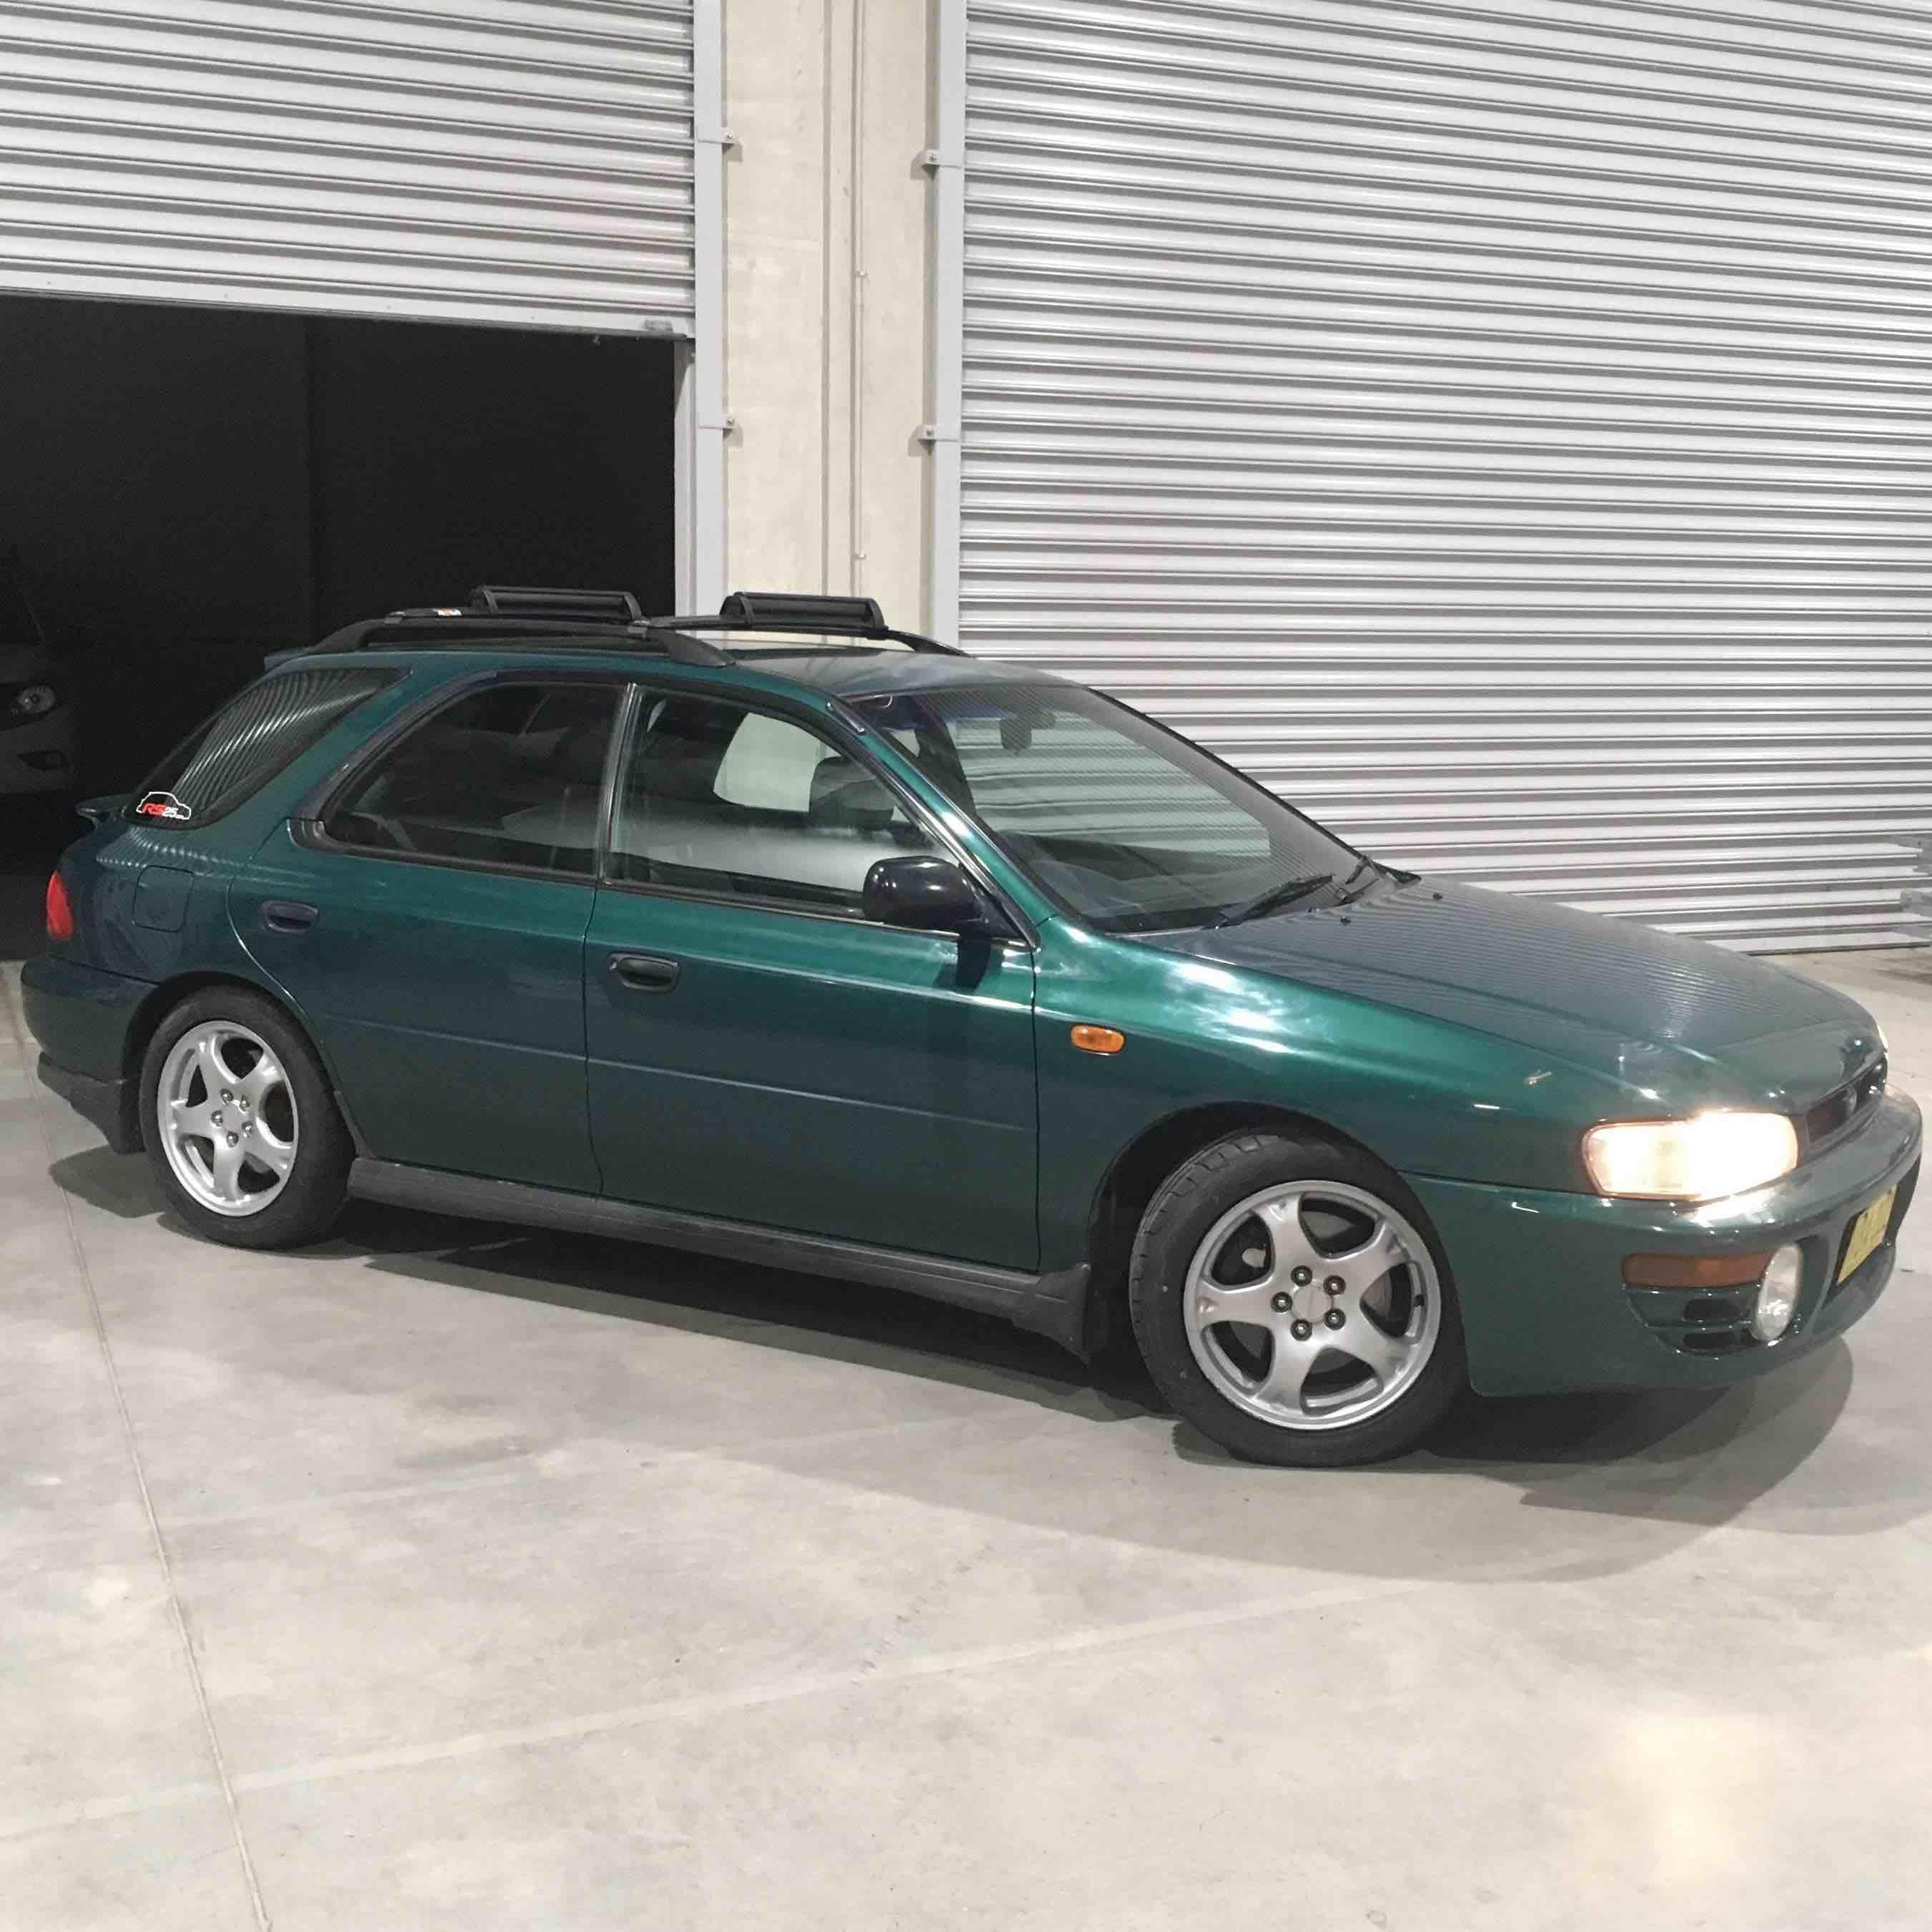 Luke's Green GF8 Wagon - To 400k and beyond-00-0001.jpg